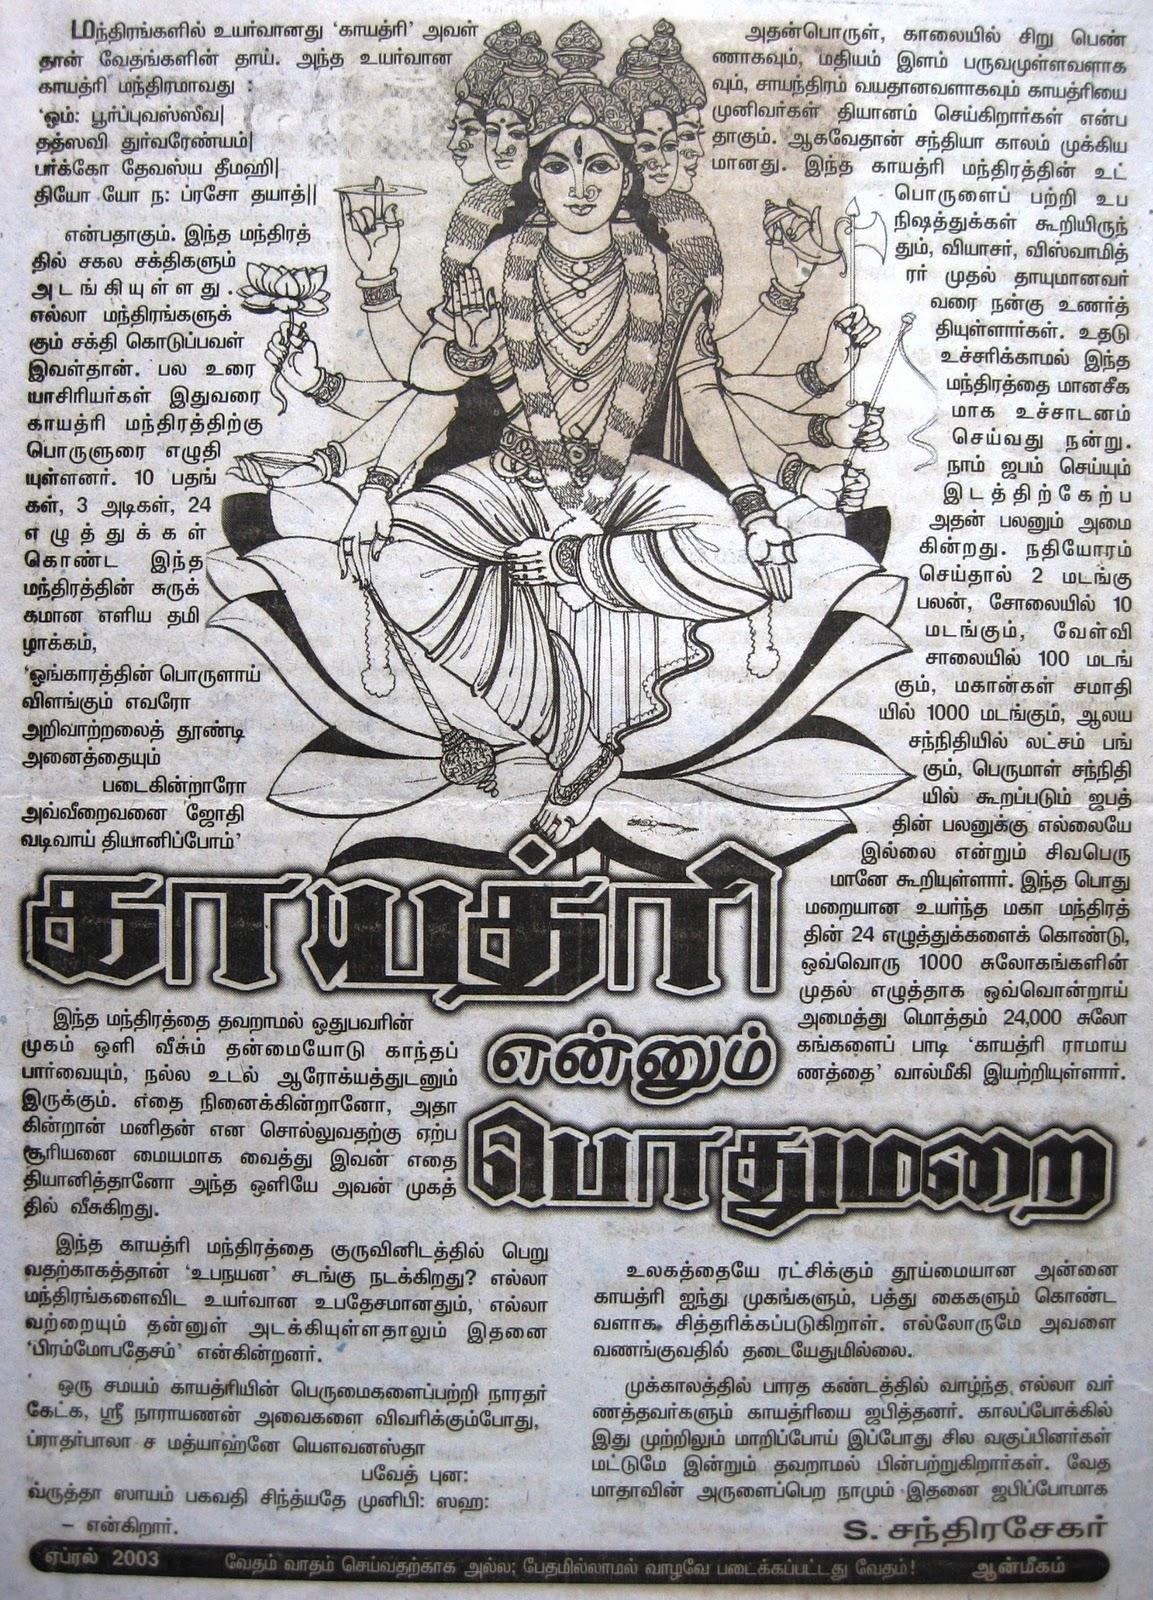 www chandru-articles blogspot in: Gayathri Mantram - Tamil